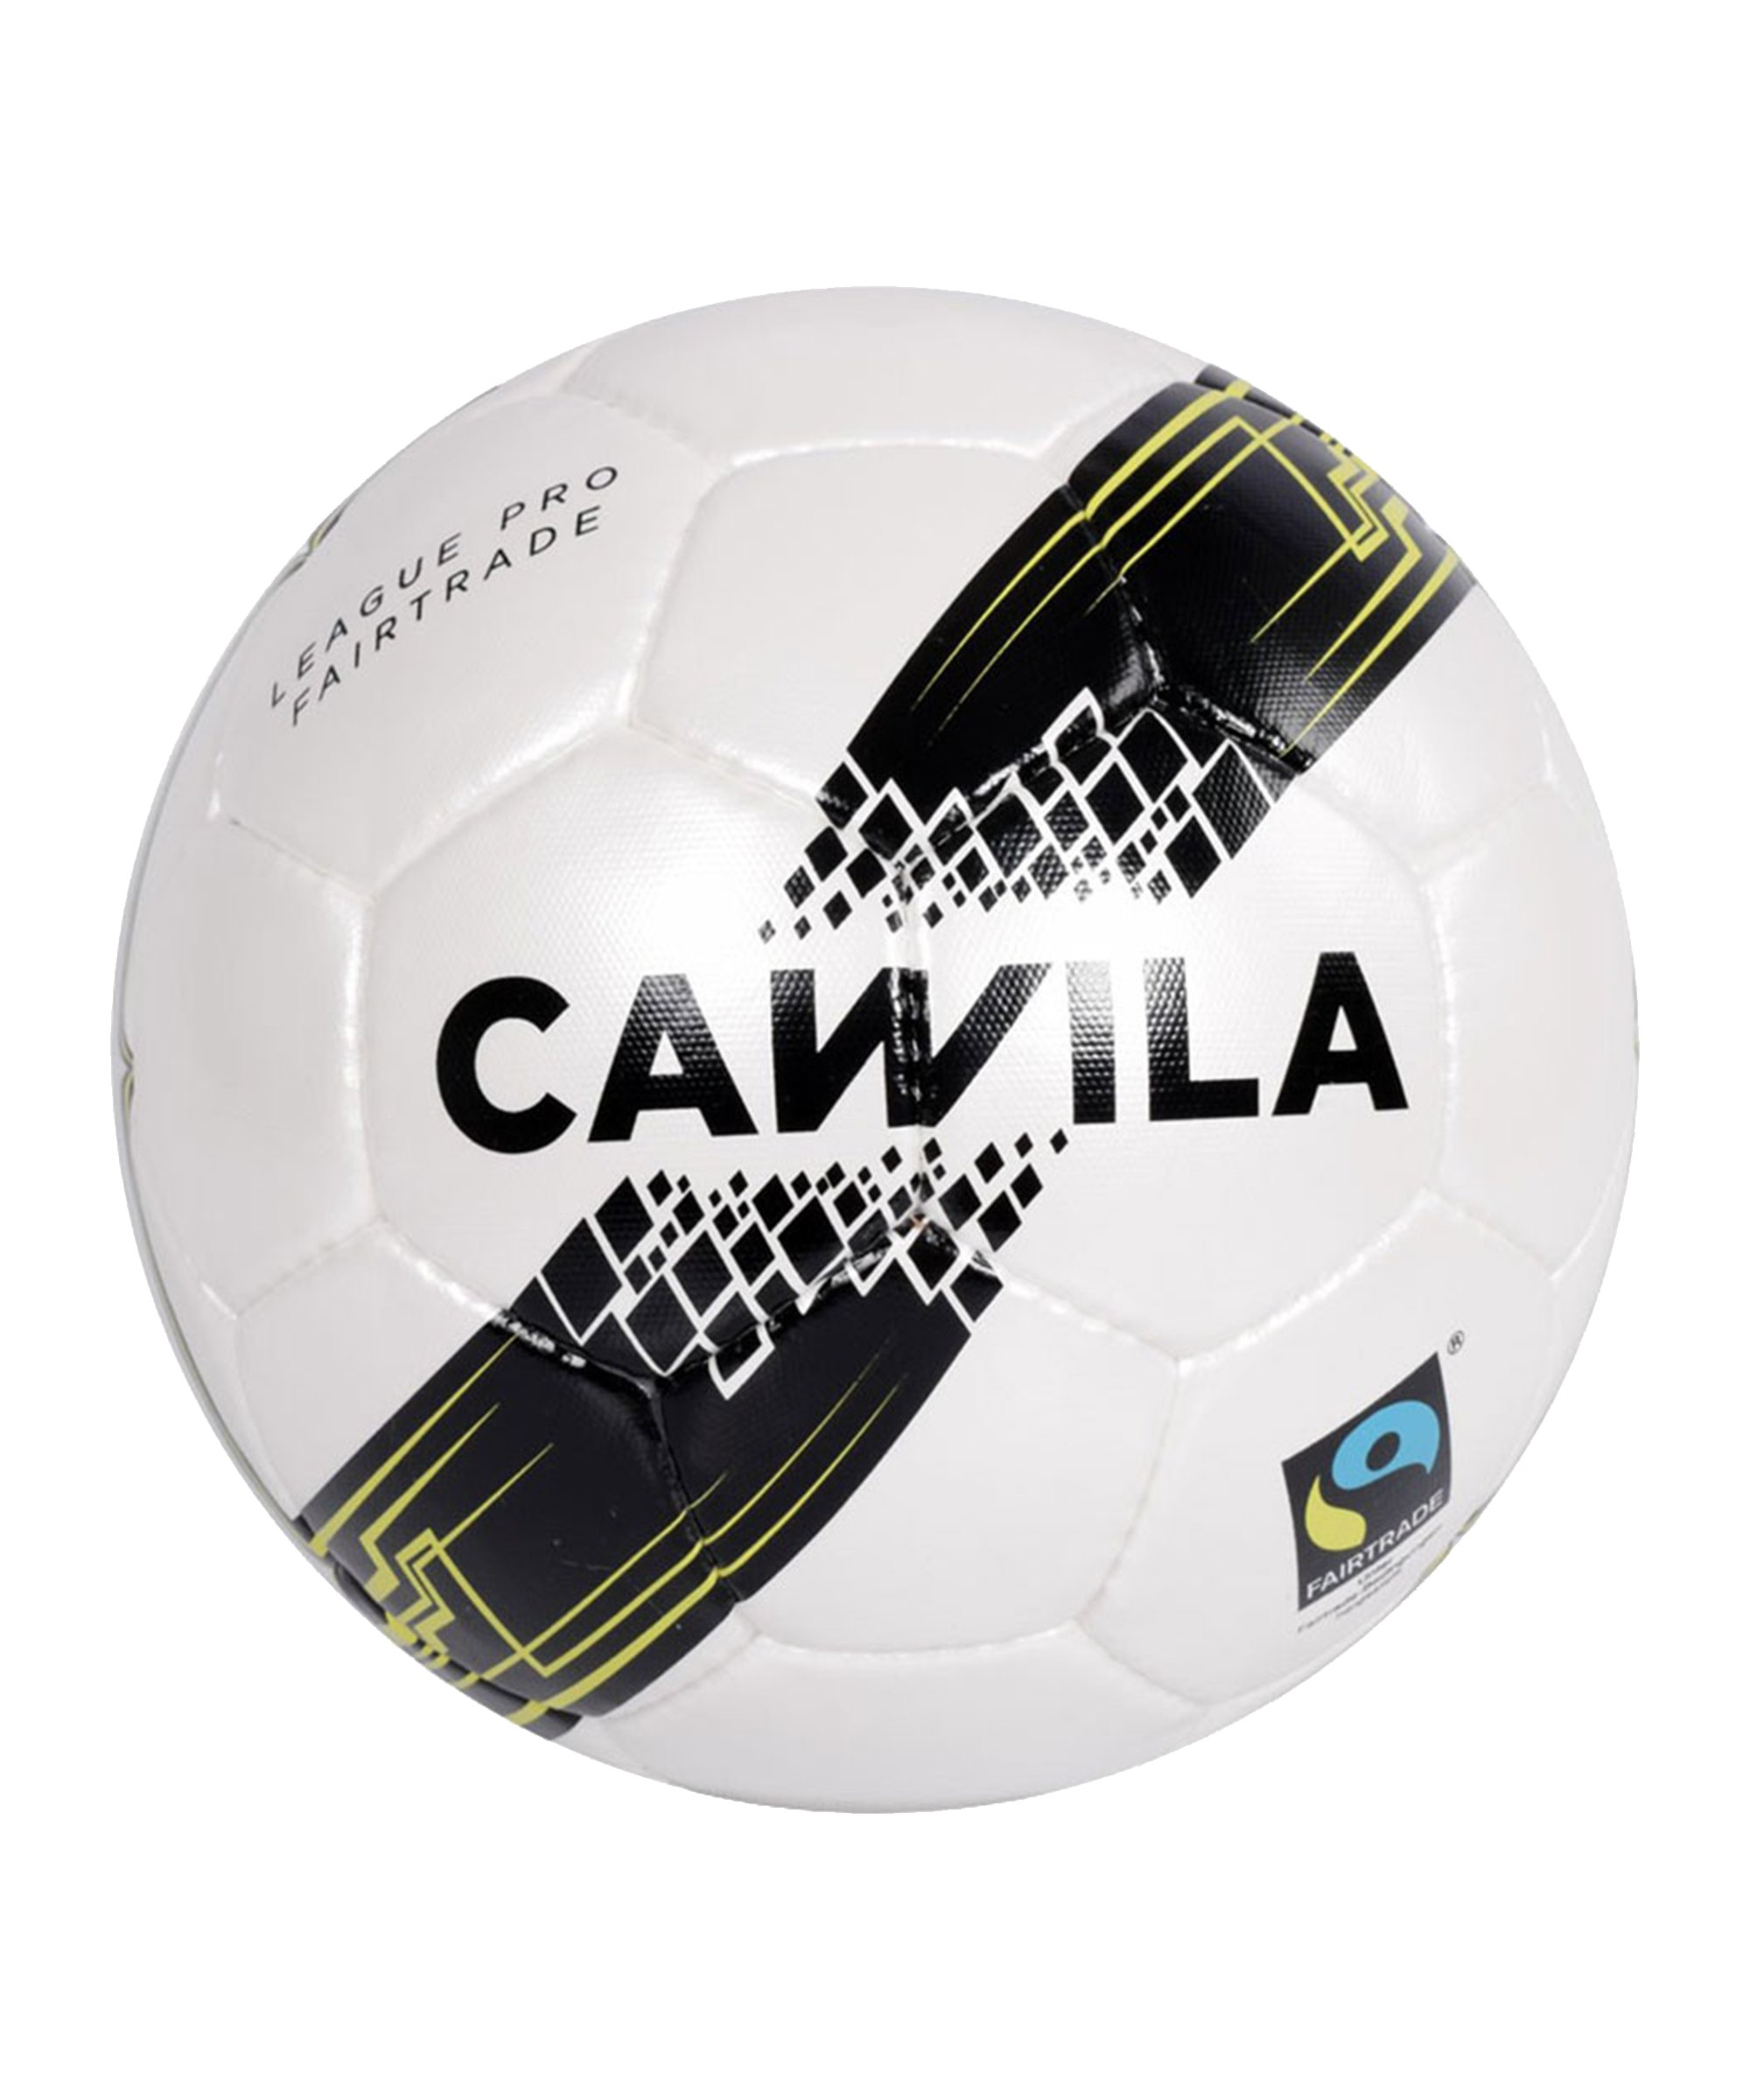 Cawila Fussball ARENA LEAGUE PRO 5 Weiss - weiss